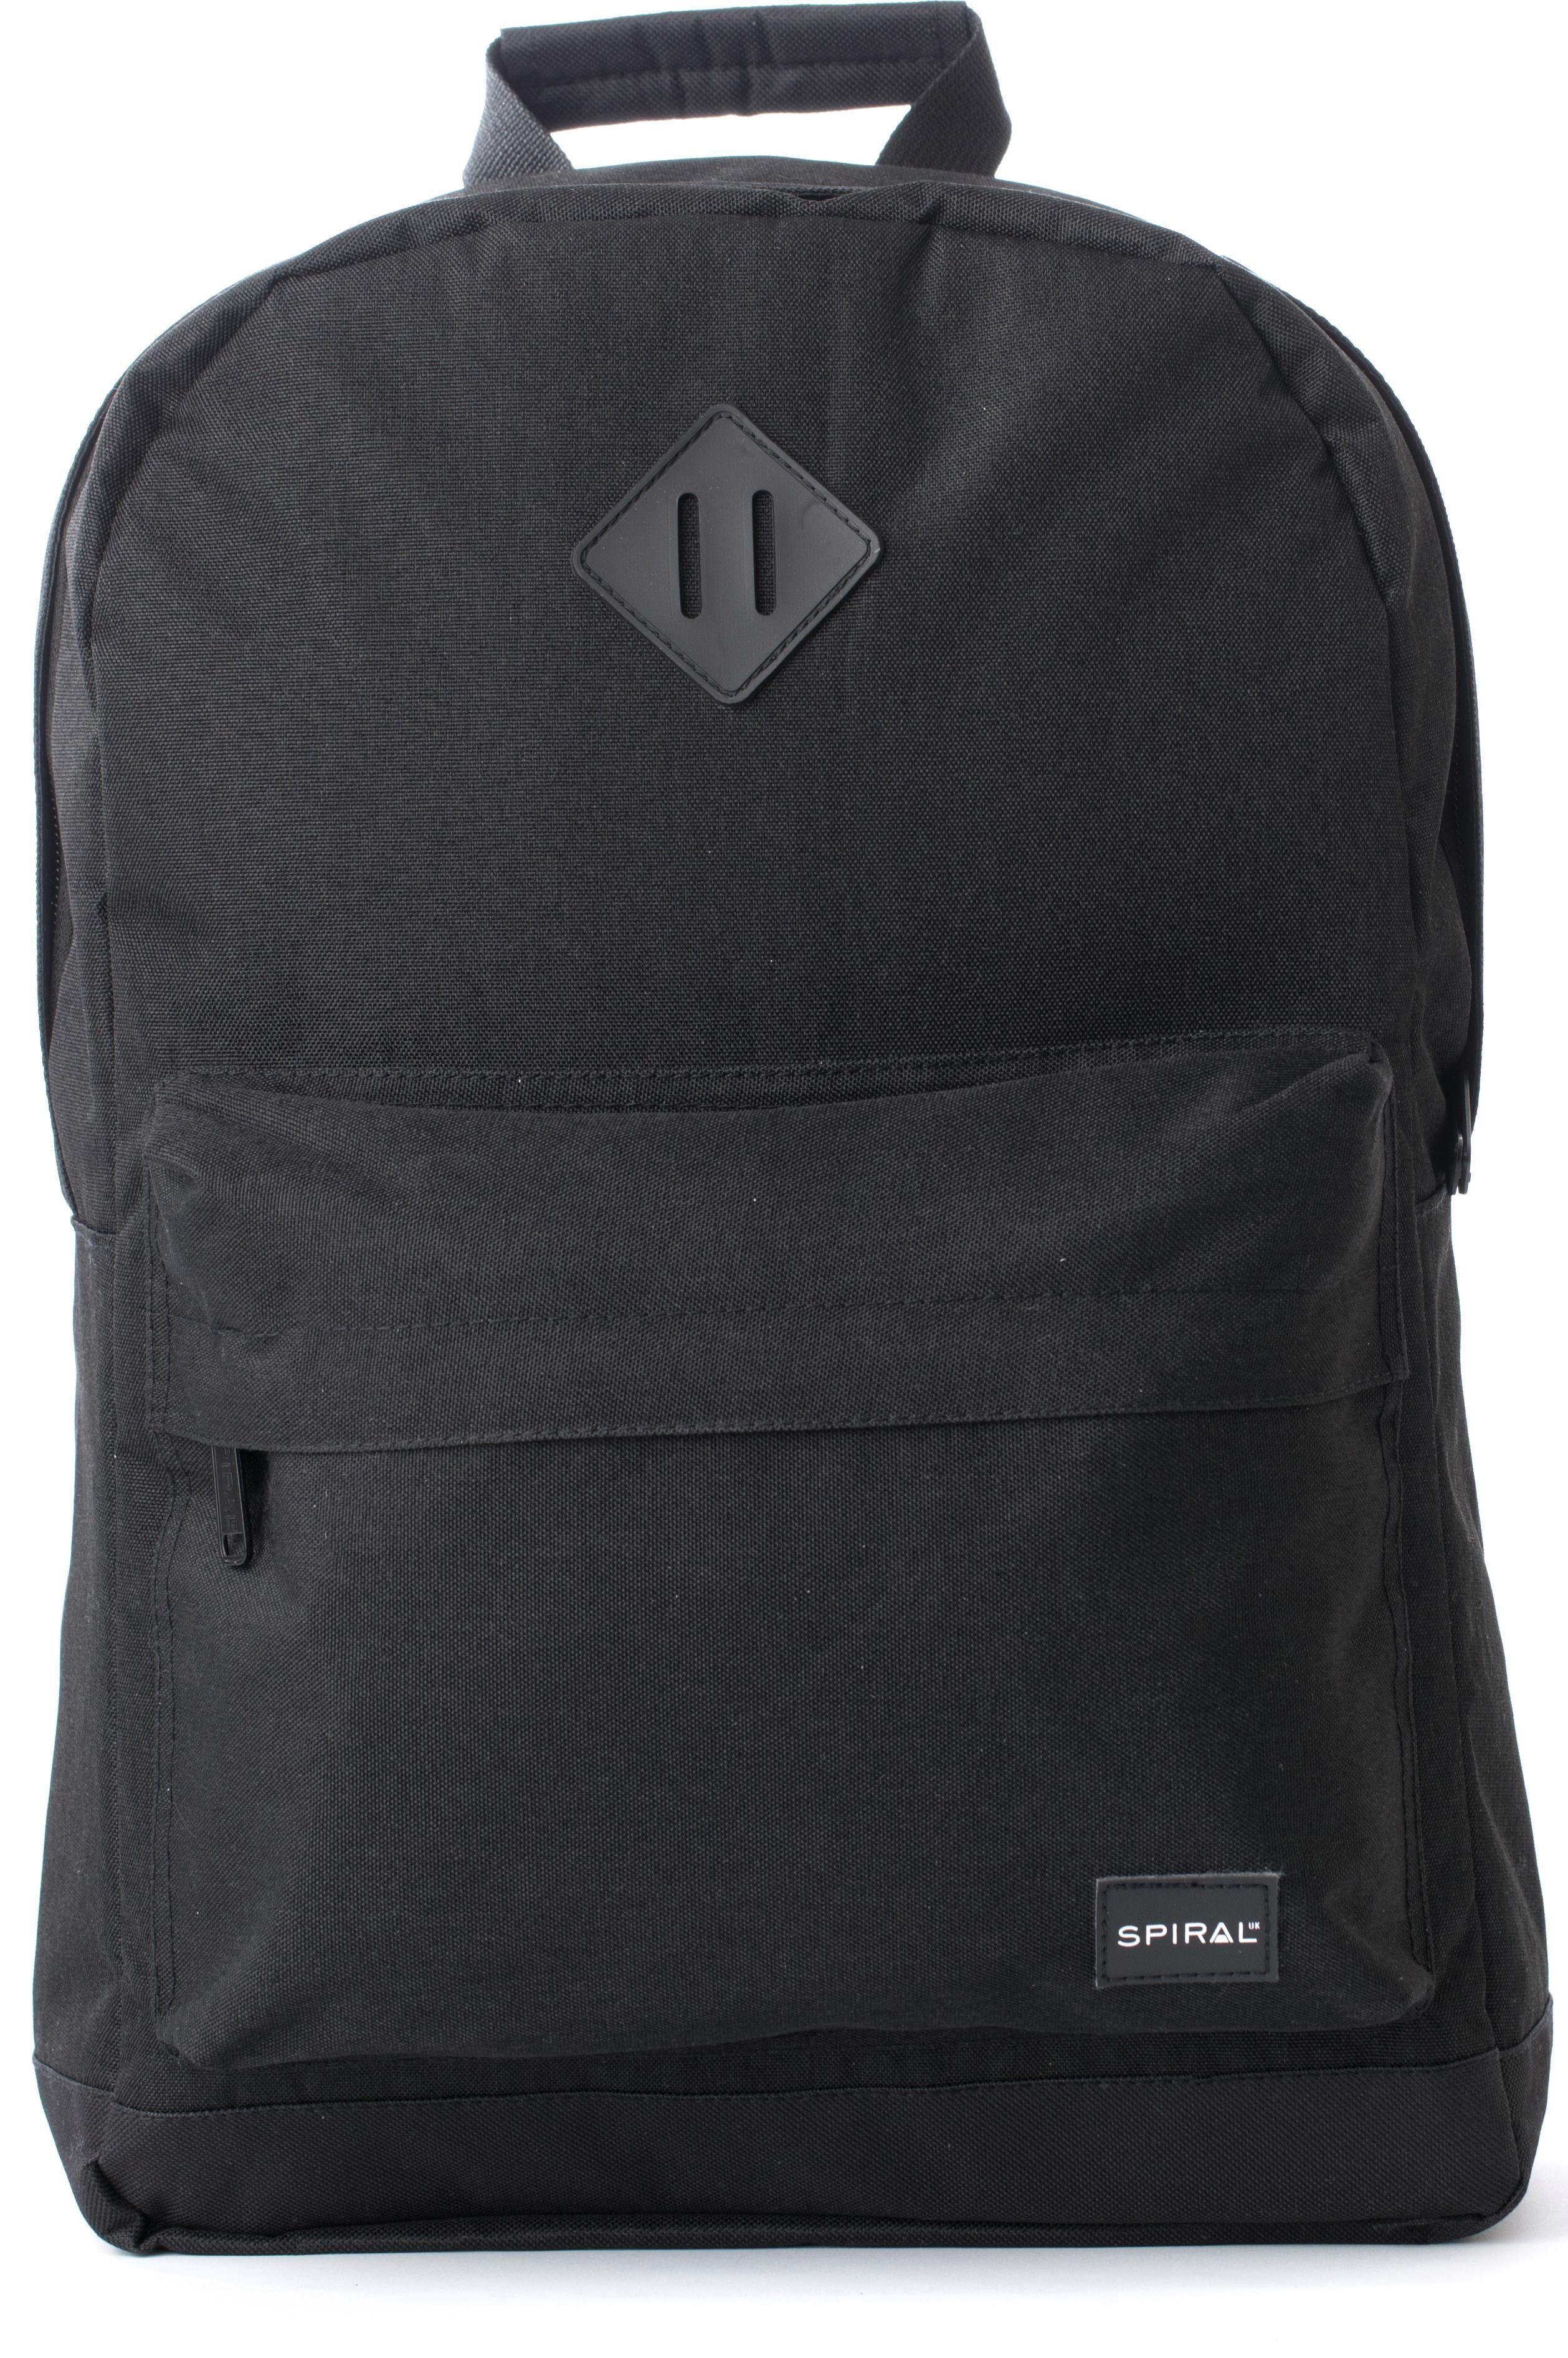 Spiral® Rucksack mit Laptopfach, »OG Core, SP Classic Black«